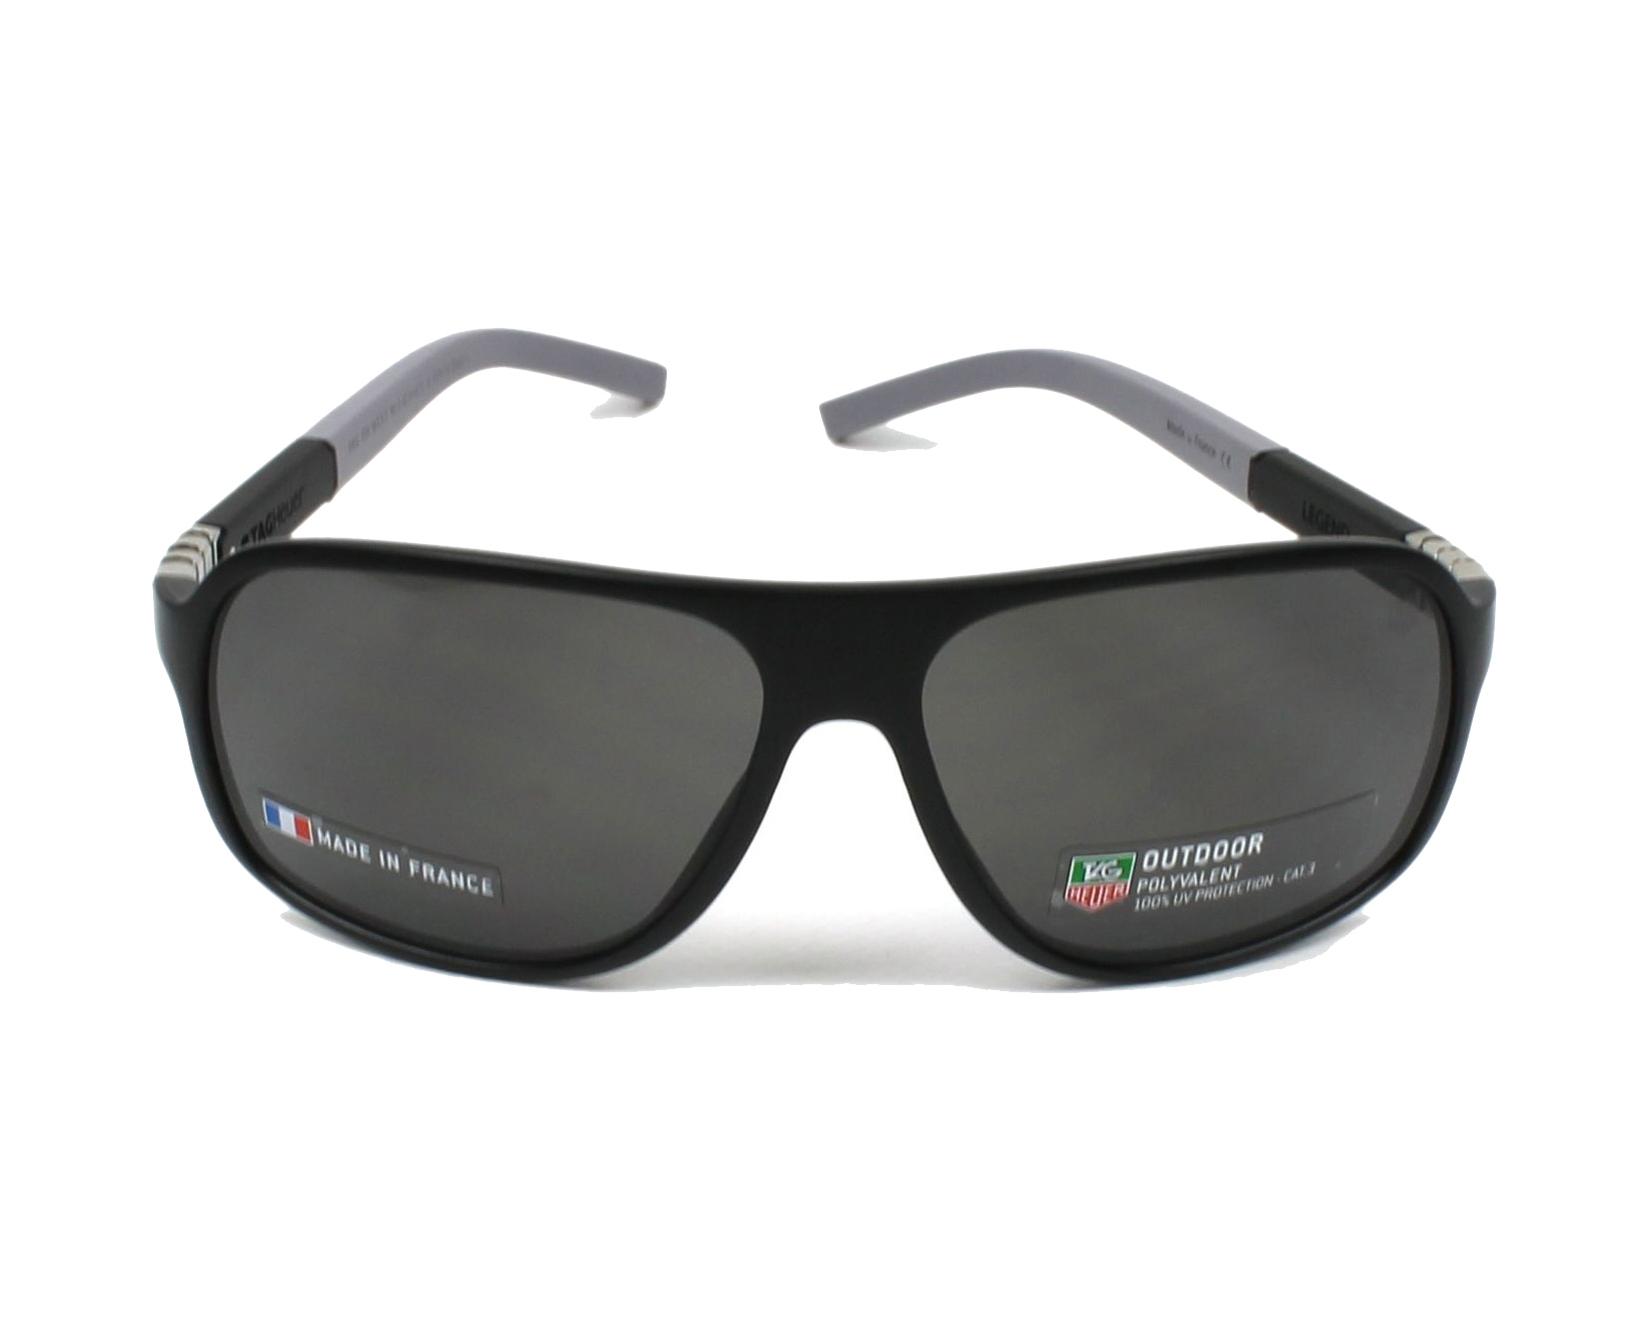 lunettes de soleil de tag heuer en th 9333 103. Black Bedroom Furniture Sets. Home Design Ideas